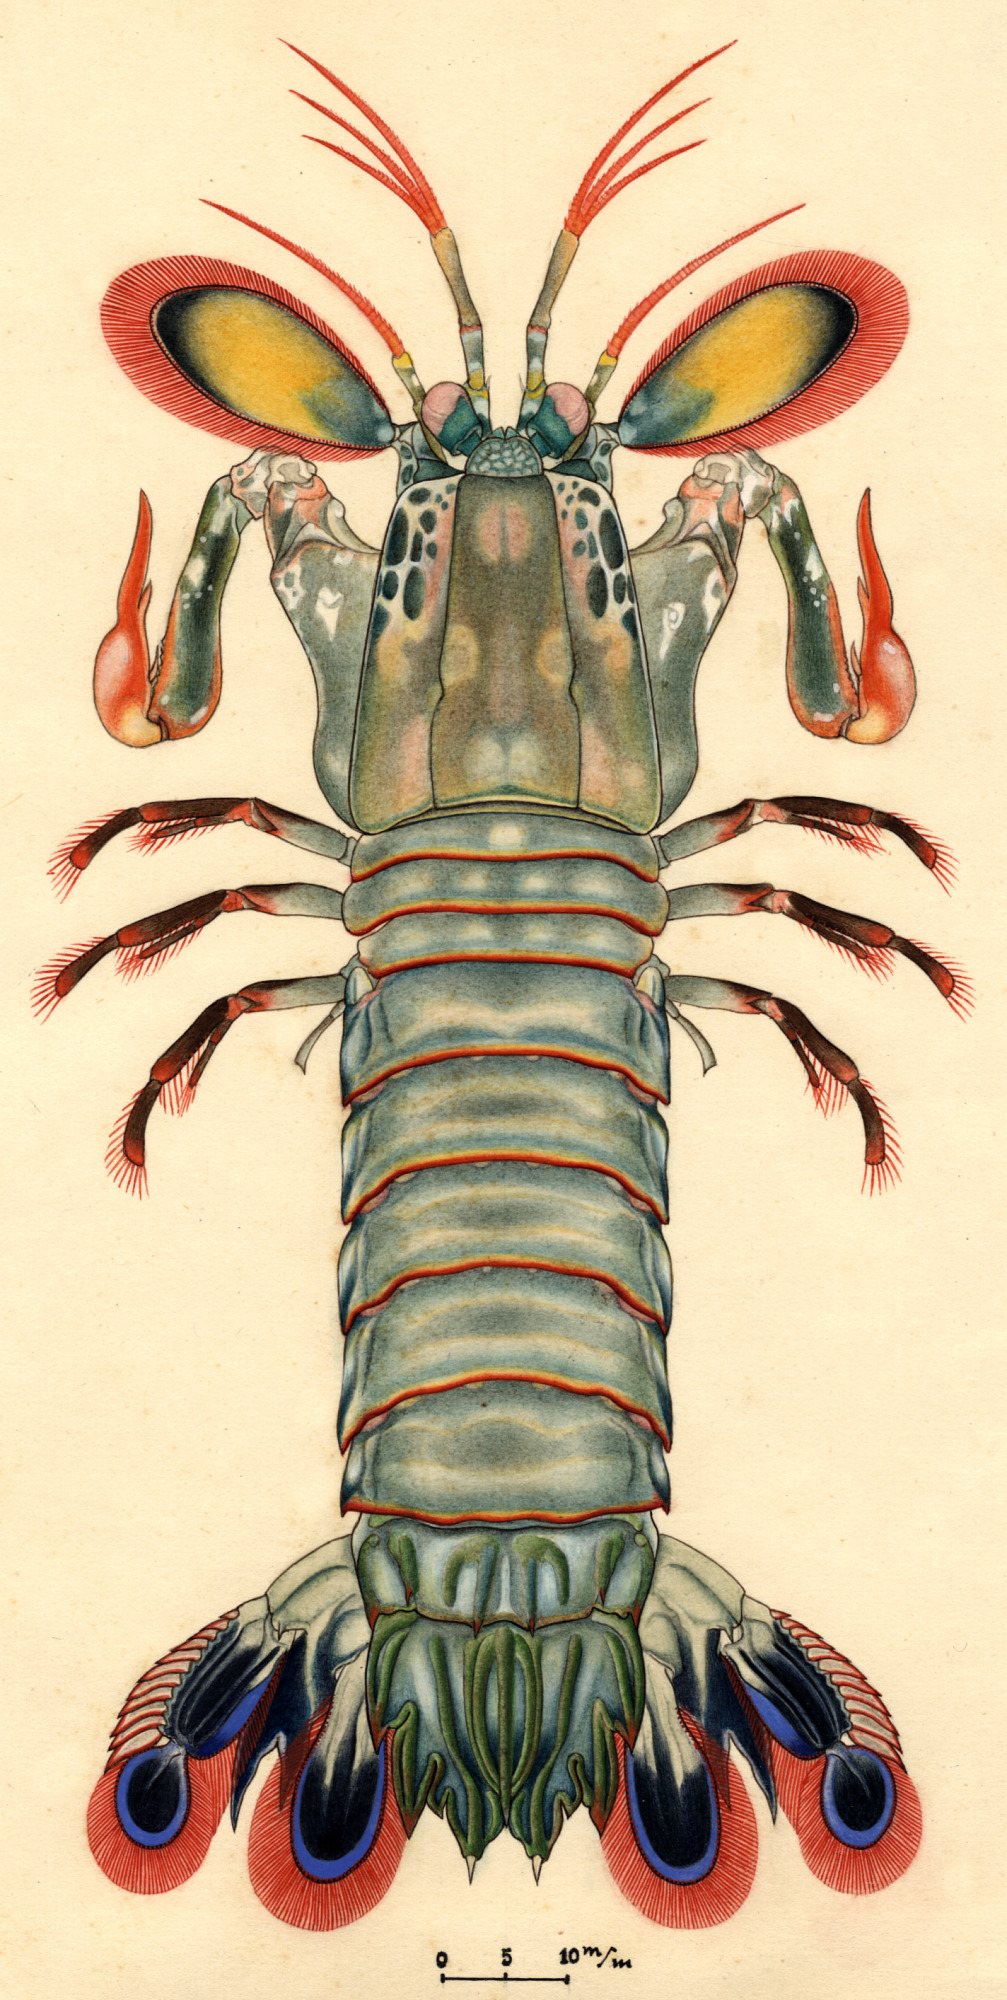 images for Odontodactylus scyllarus (Linnaeus, 1758)